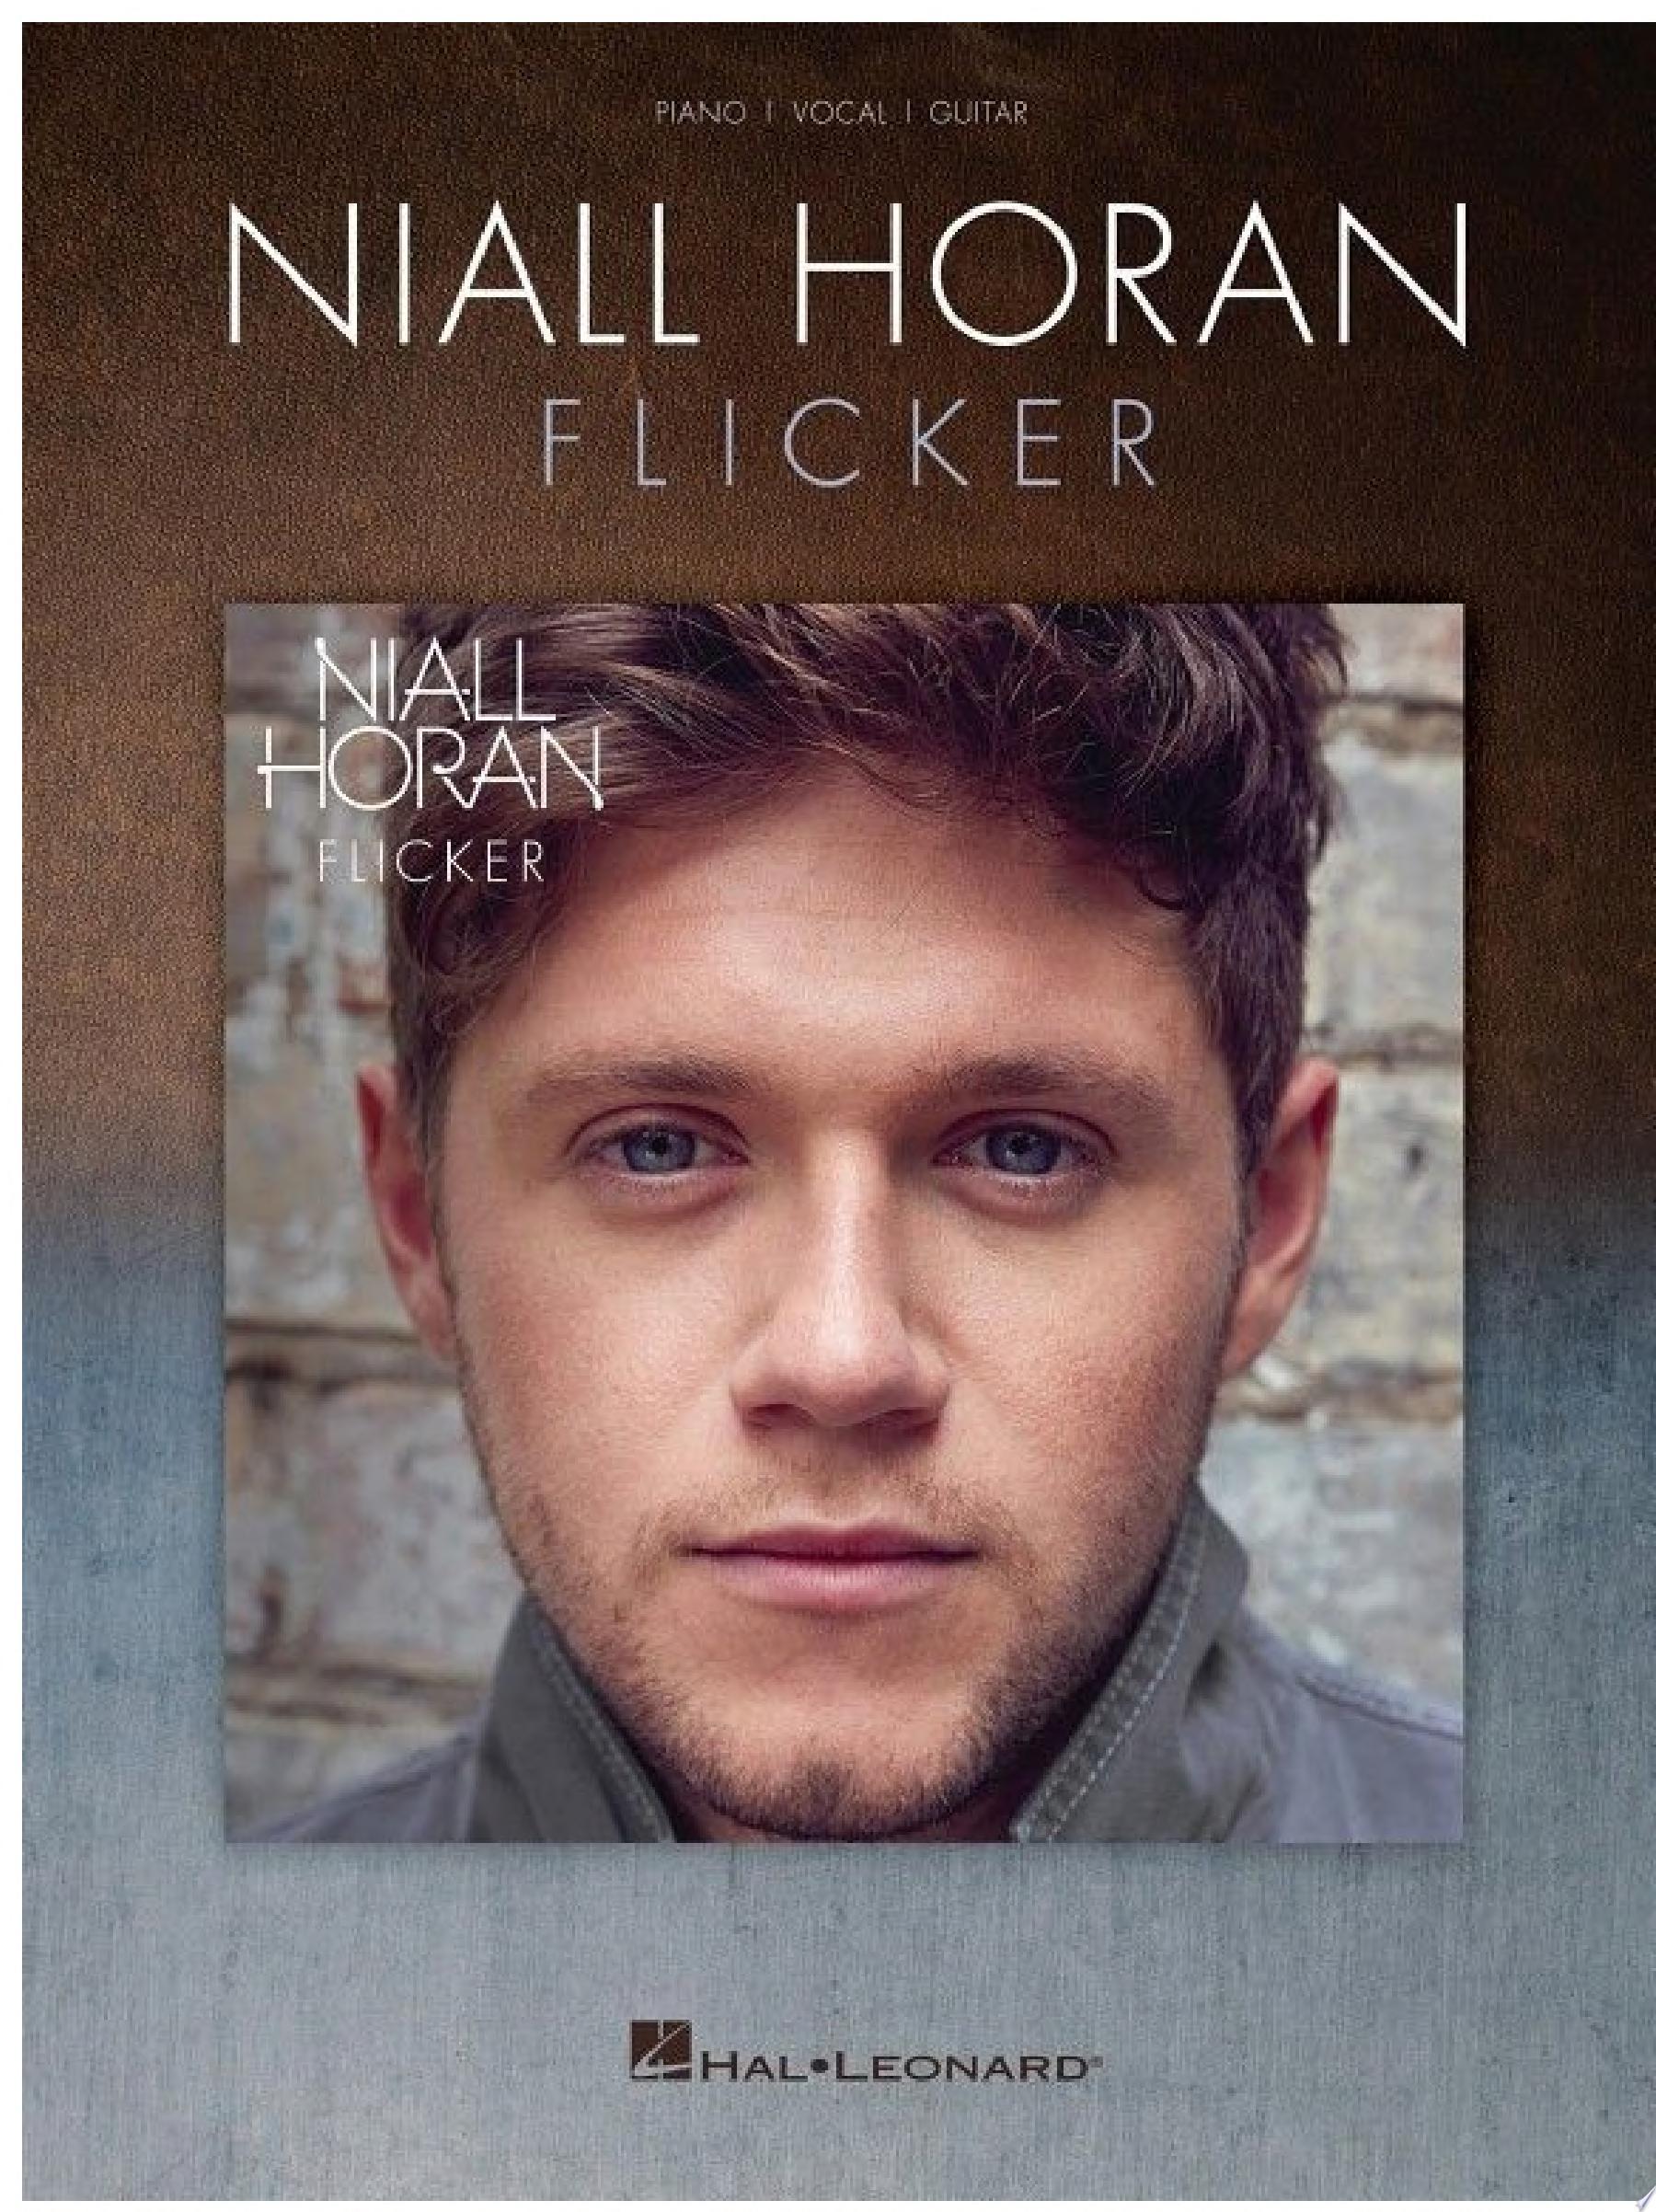 Niall Horan   Flicker Songbook